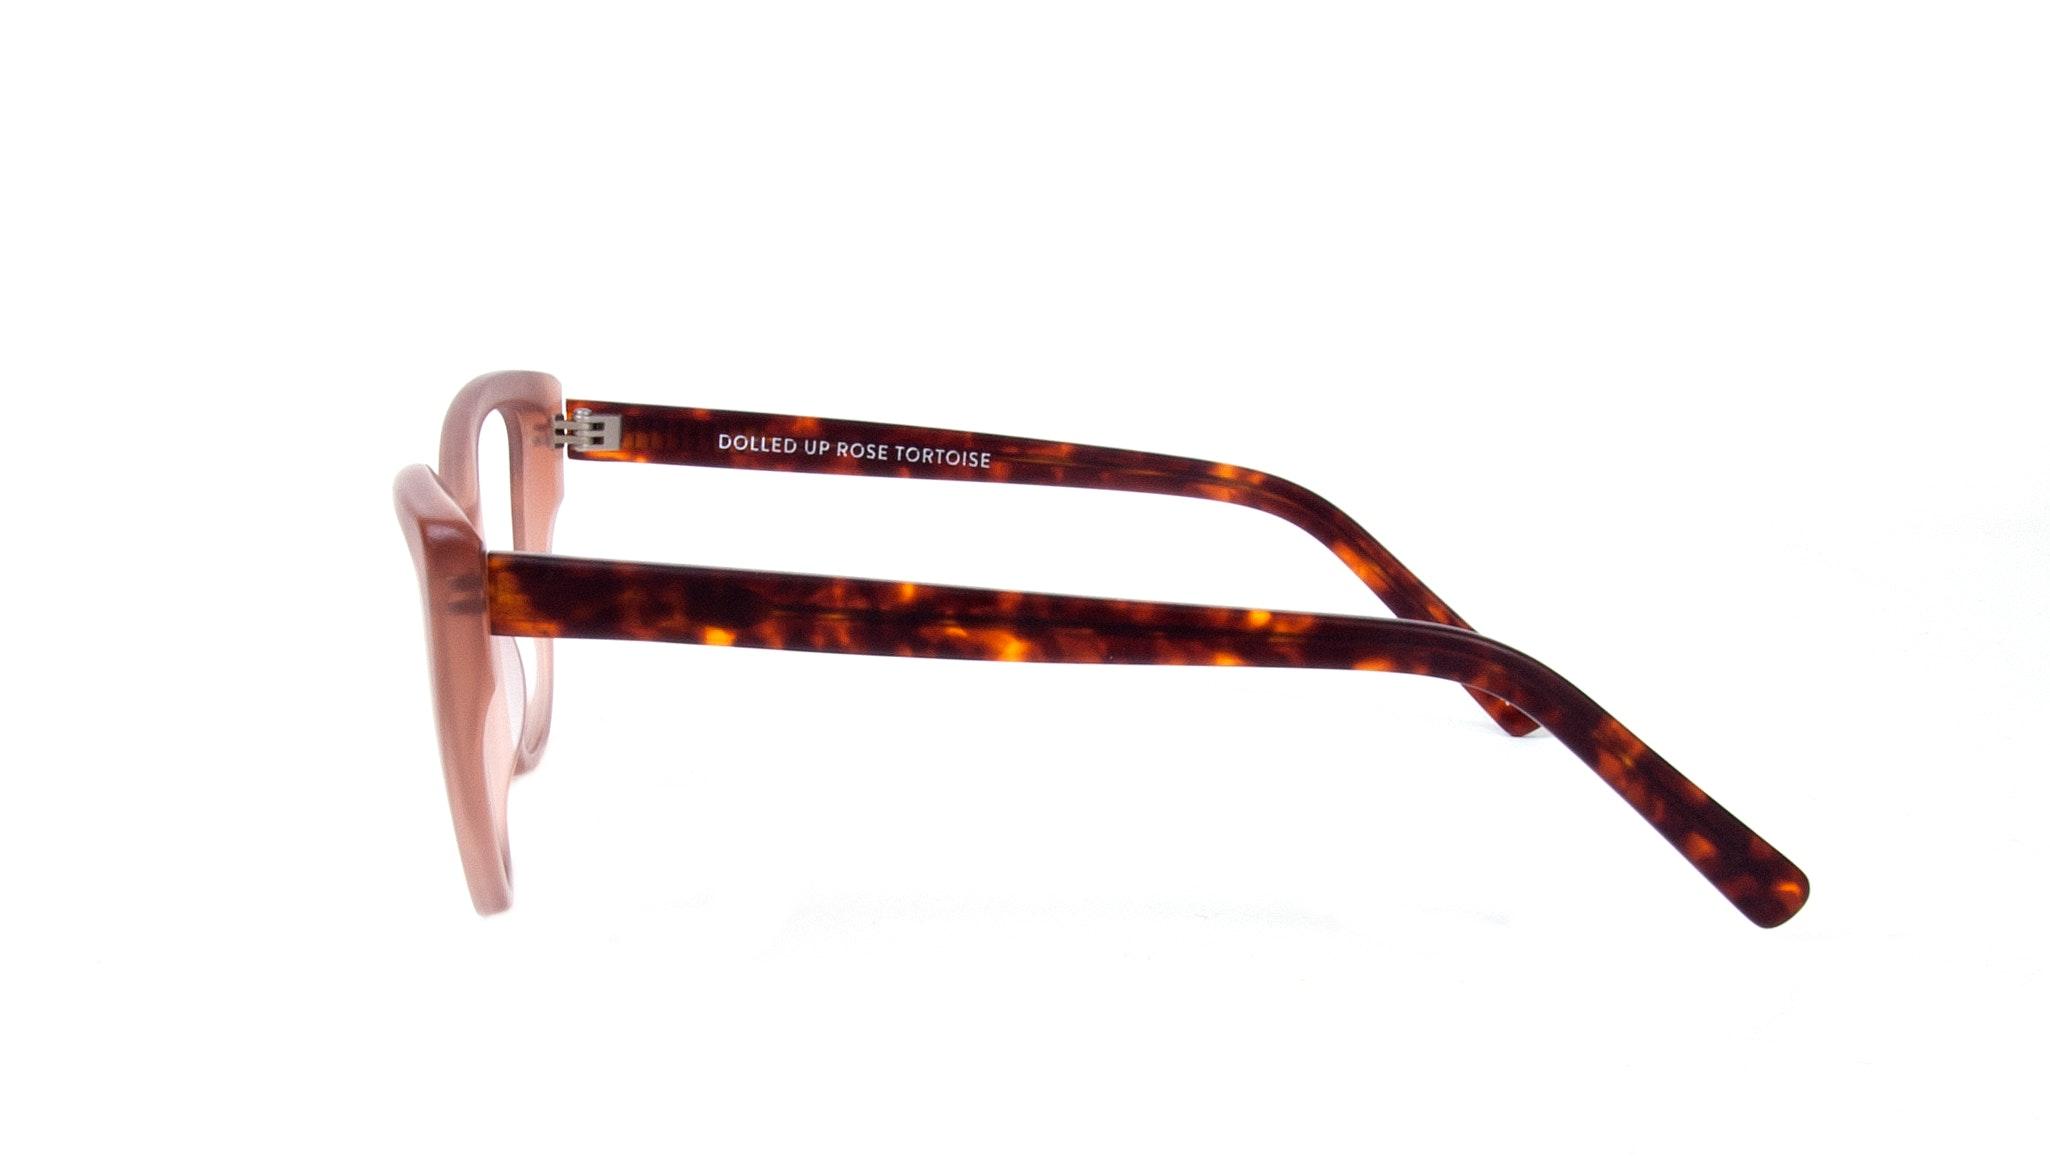 Affordable Fashion Glasses Cat Eye Eyeglasses Women Dolled Up Rose Tortoise Matte Side